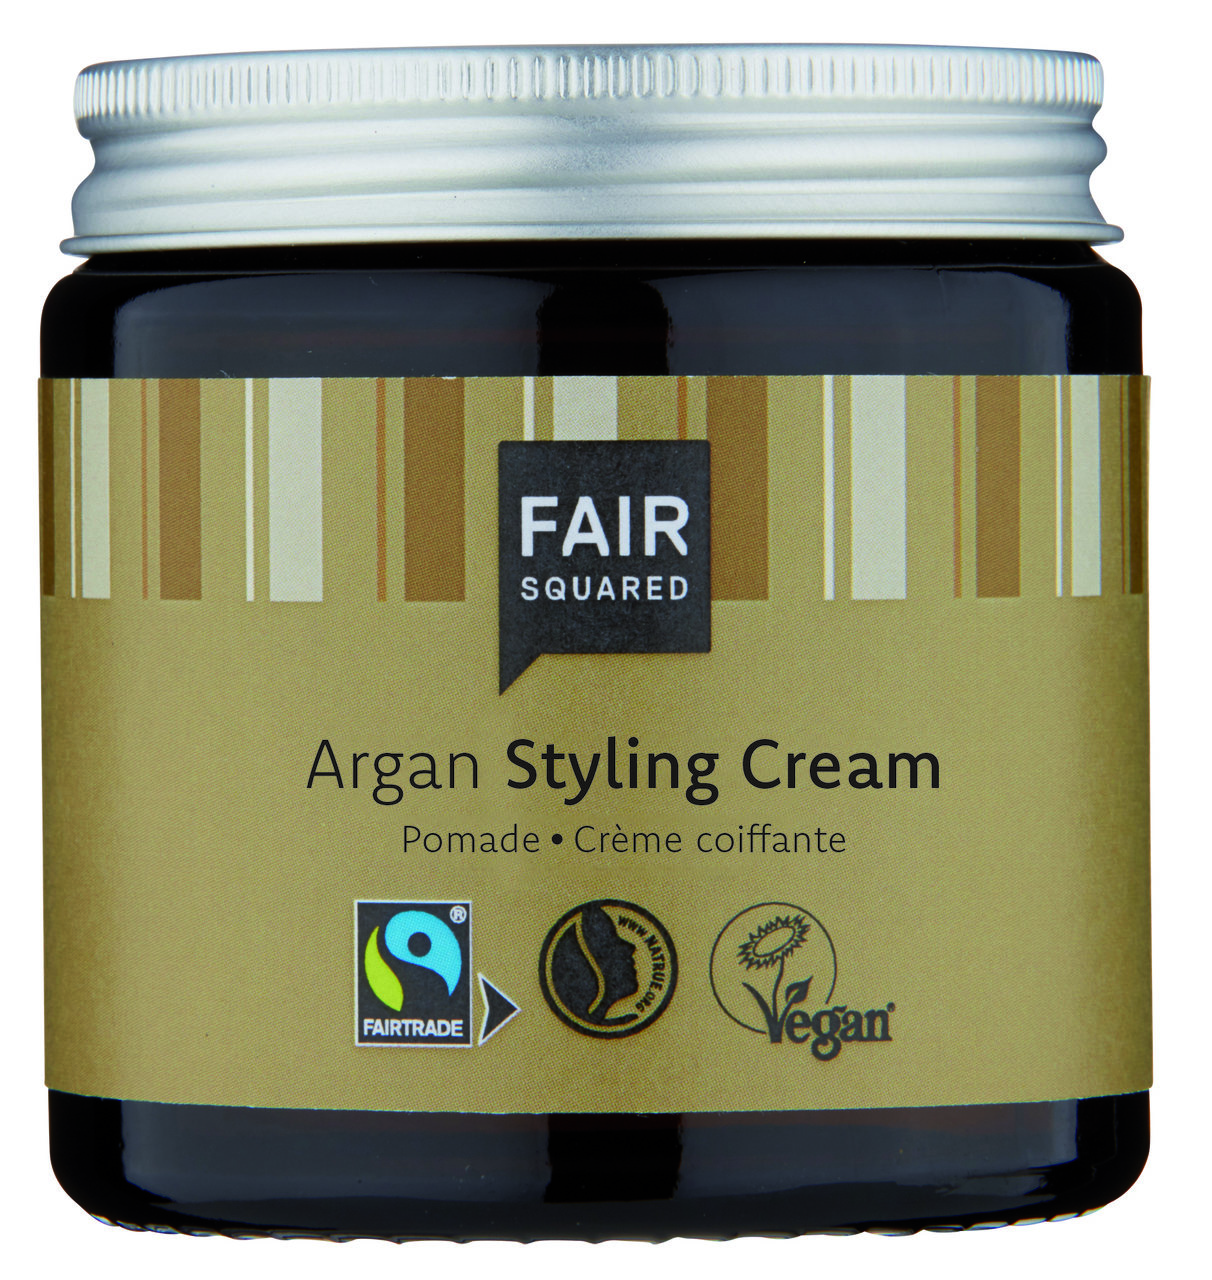 FAIR SQUARED Styling Cream Argan 100ml